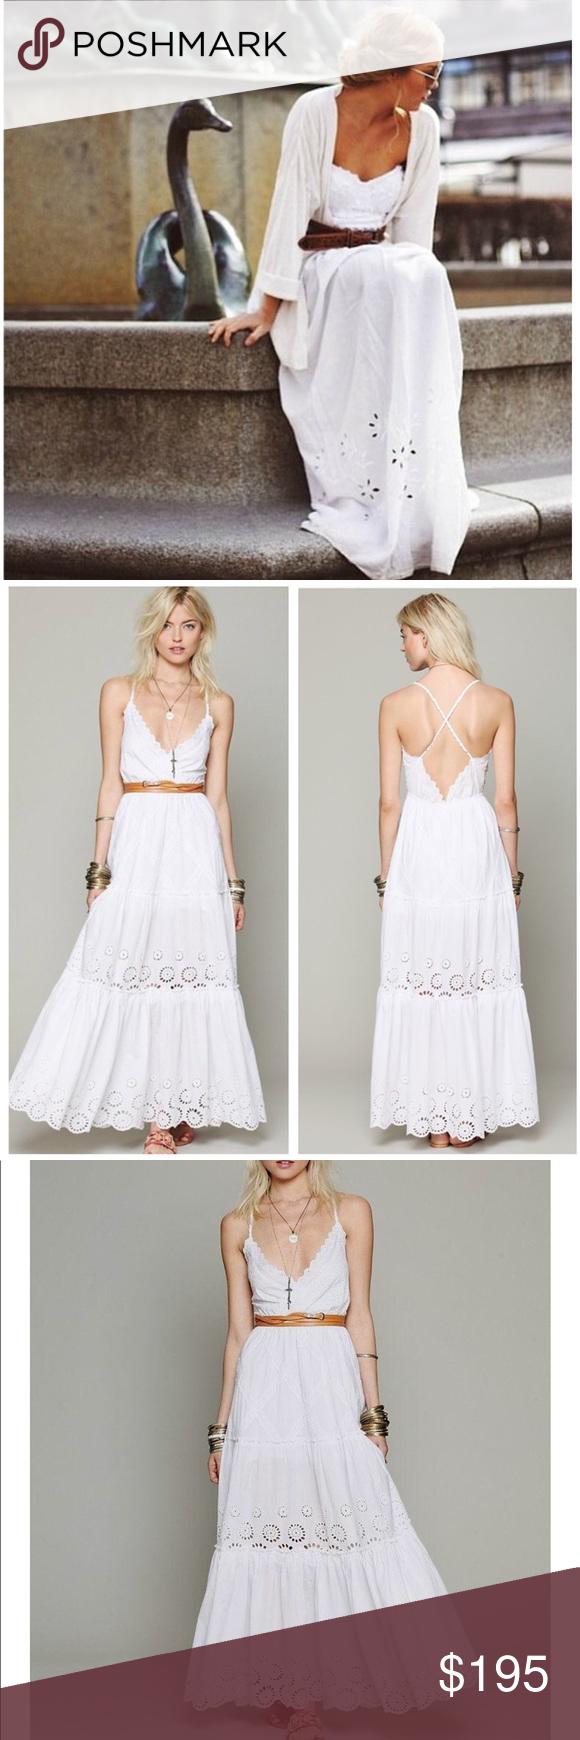 Eyelet wedding dress  FREE PEOPLE OPHELIA MAXI DRESS white eyelet M LONG  My Posh Picks